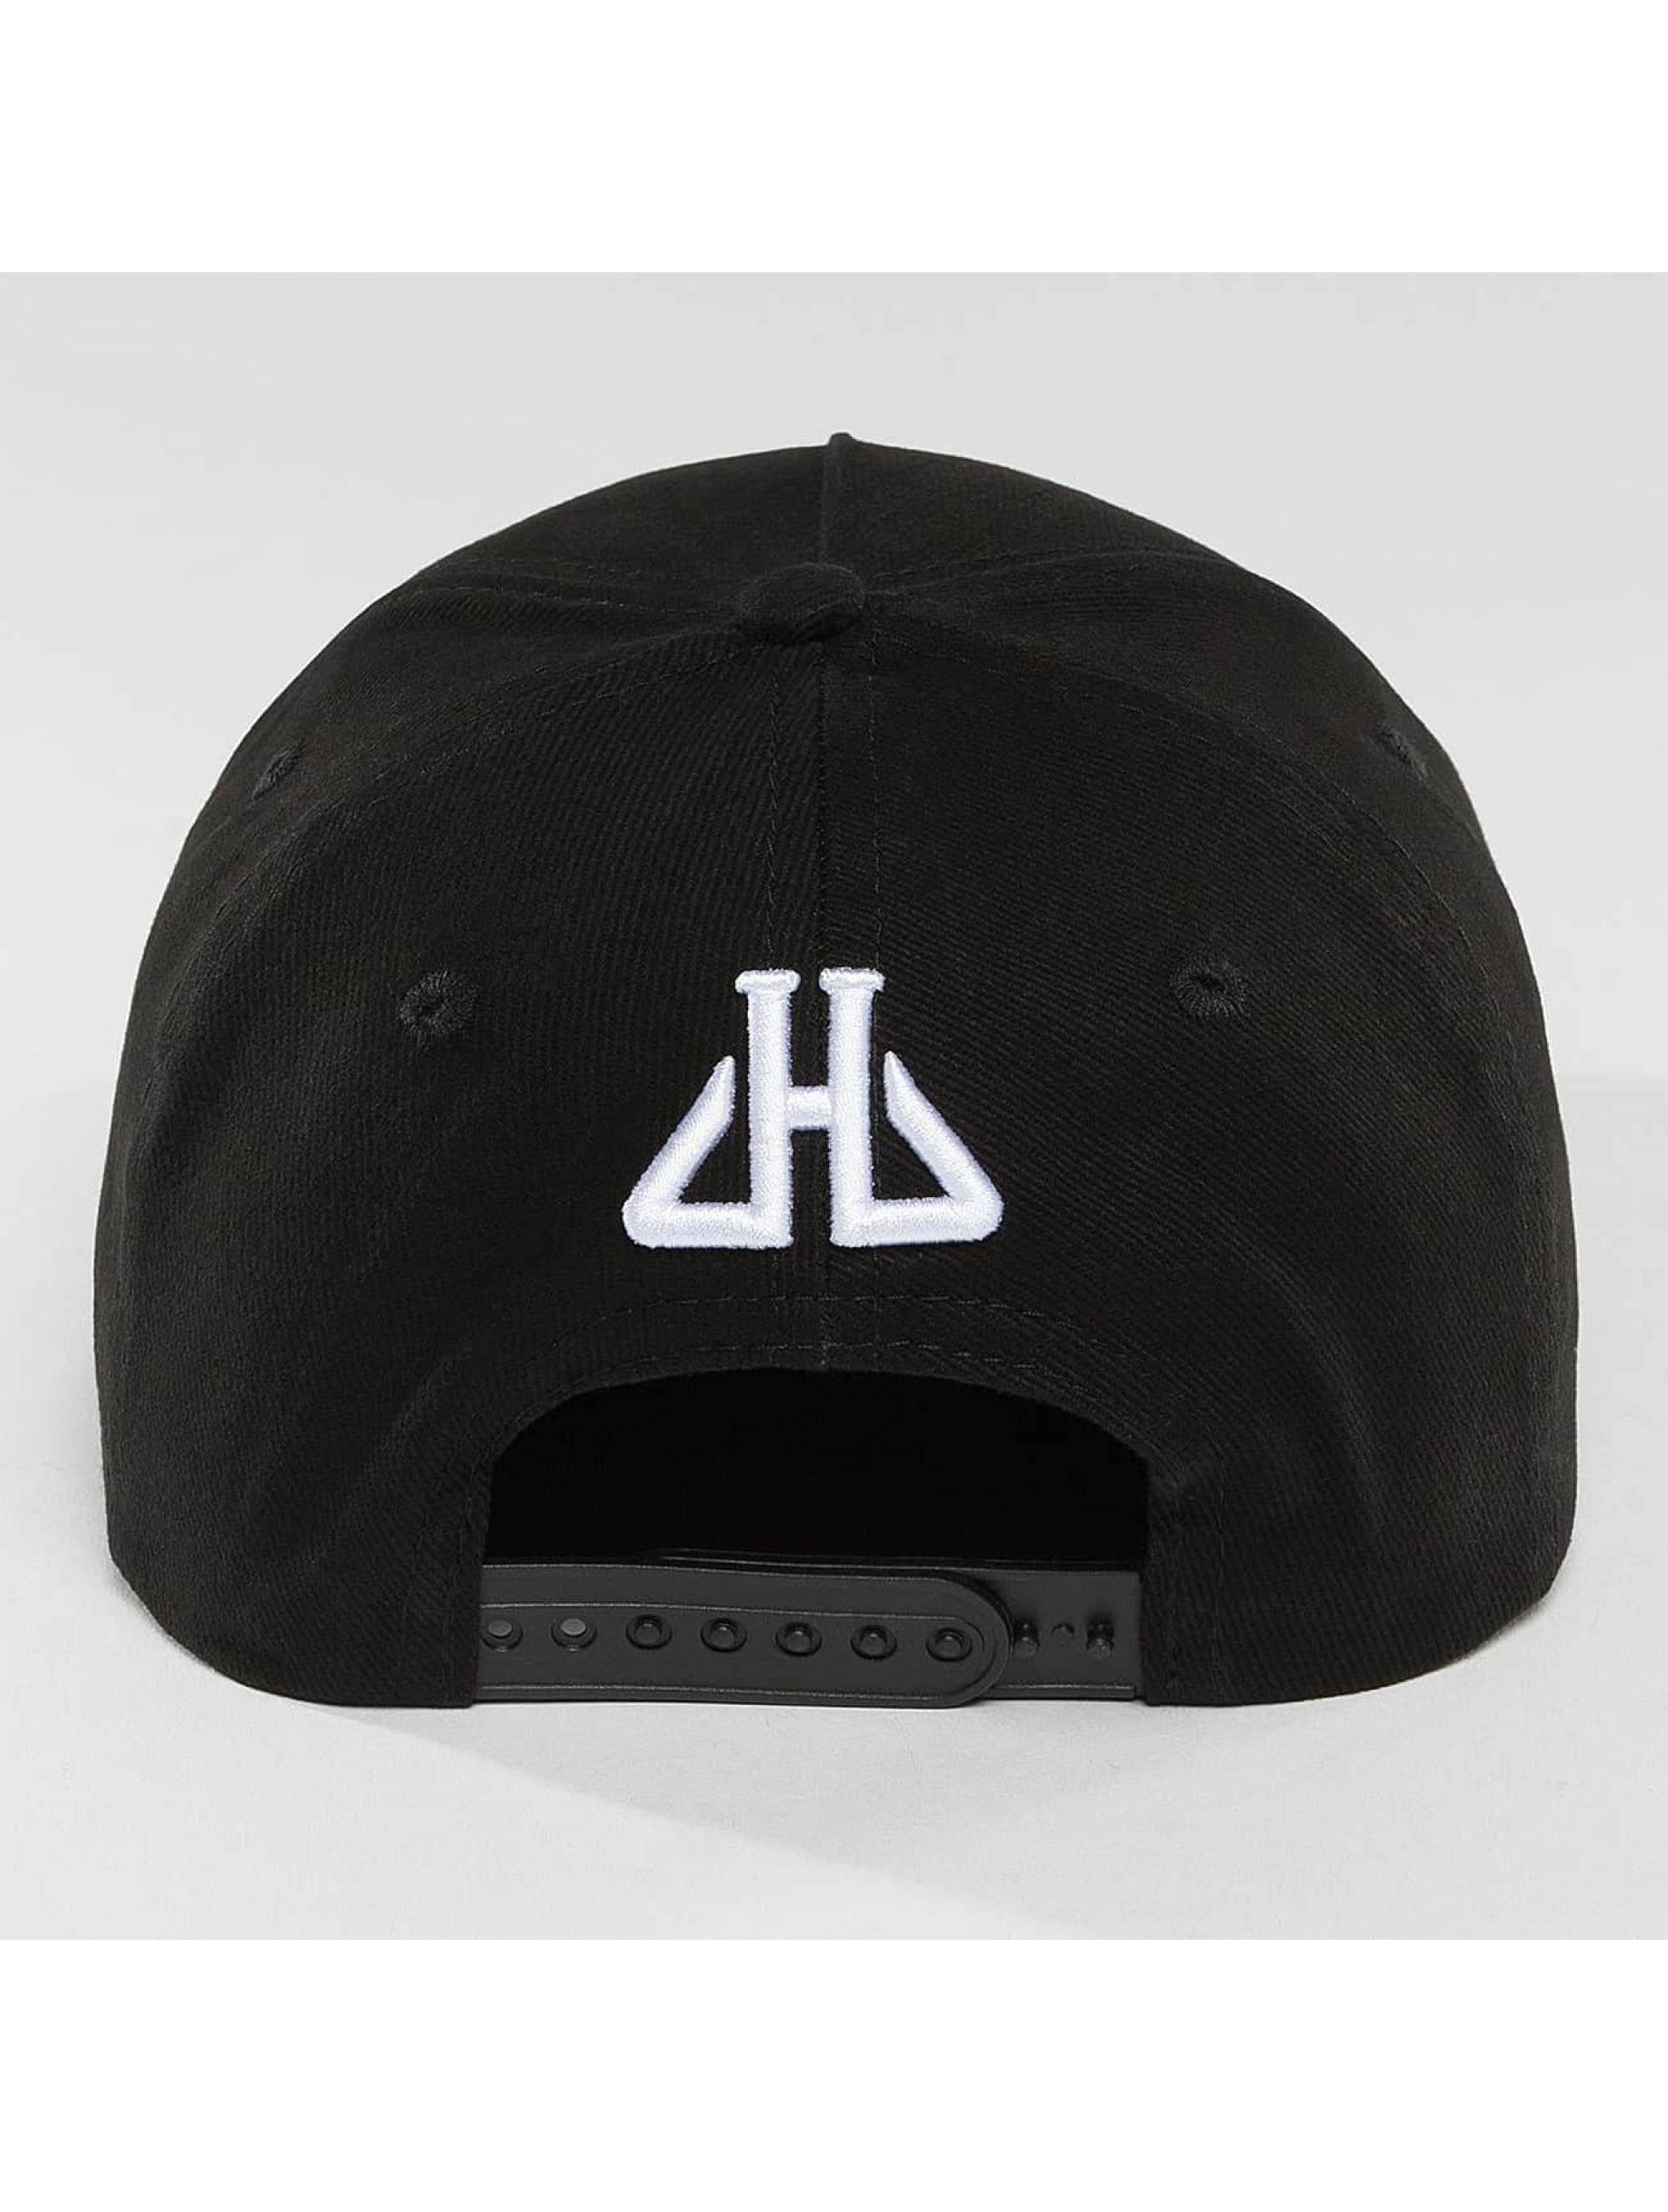 Horspist Snapback Caps Remenber svart